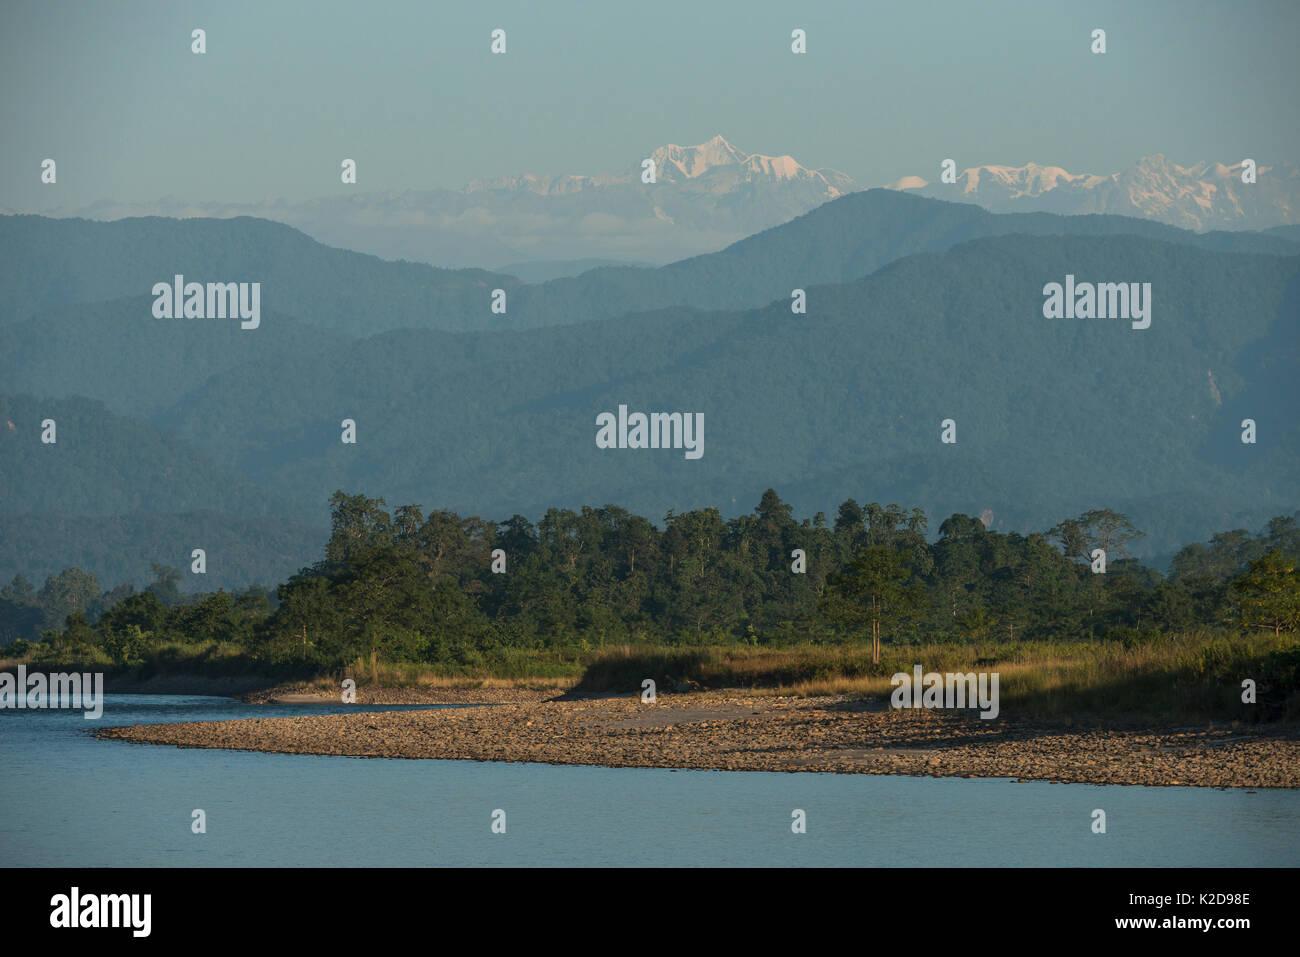 Landscape of Jai Bhoralli River and Mount Gorichand, Nameri Wildlife Reserve, Assam, North East India. November 2014. - Stock Image